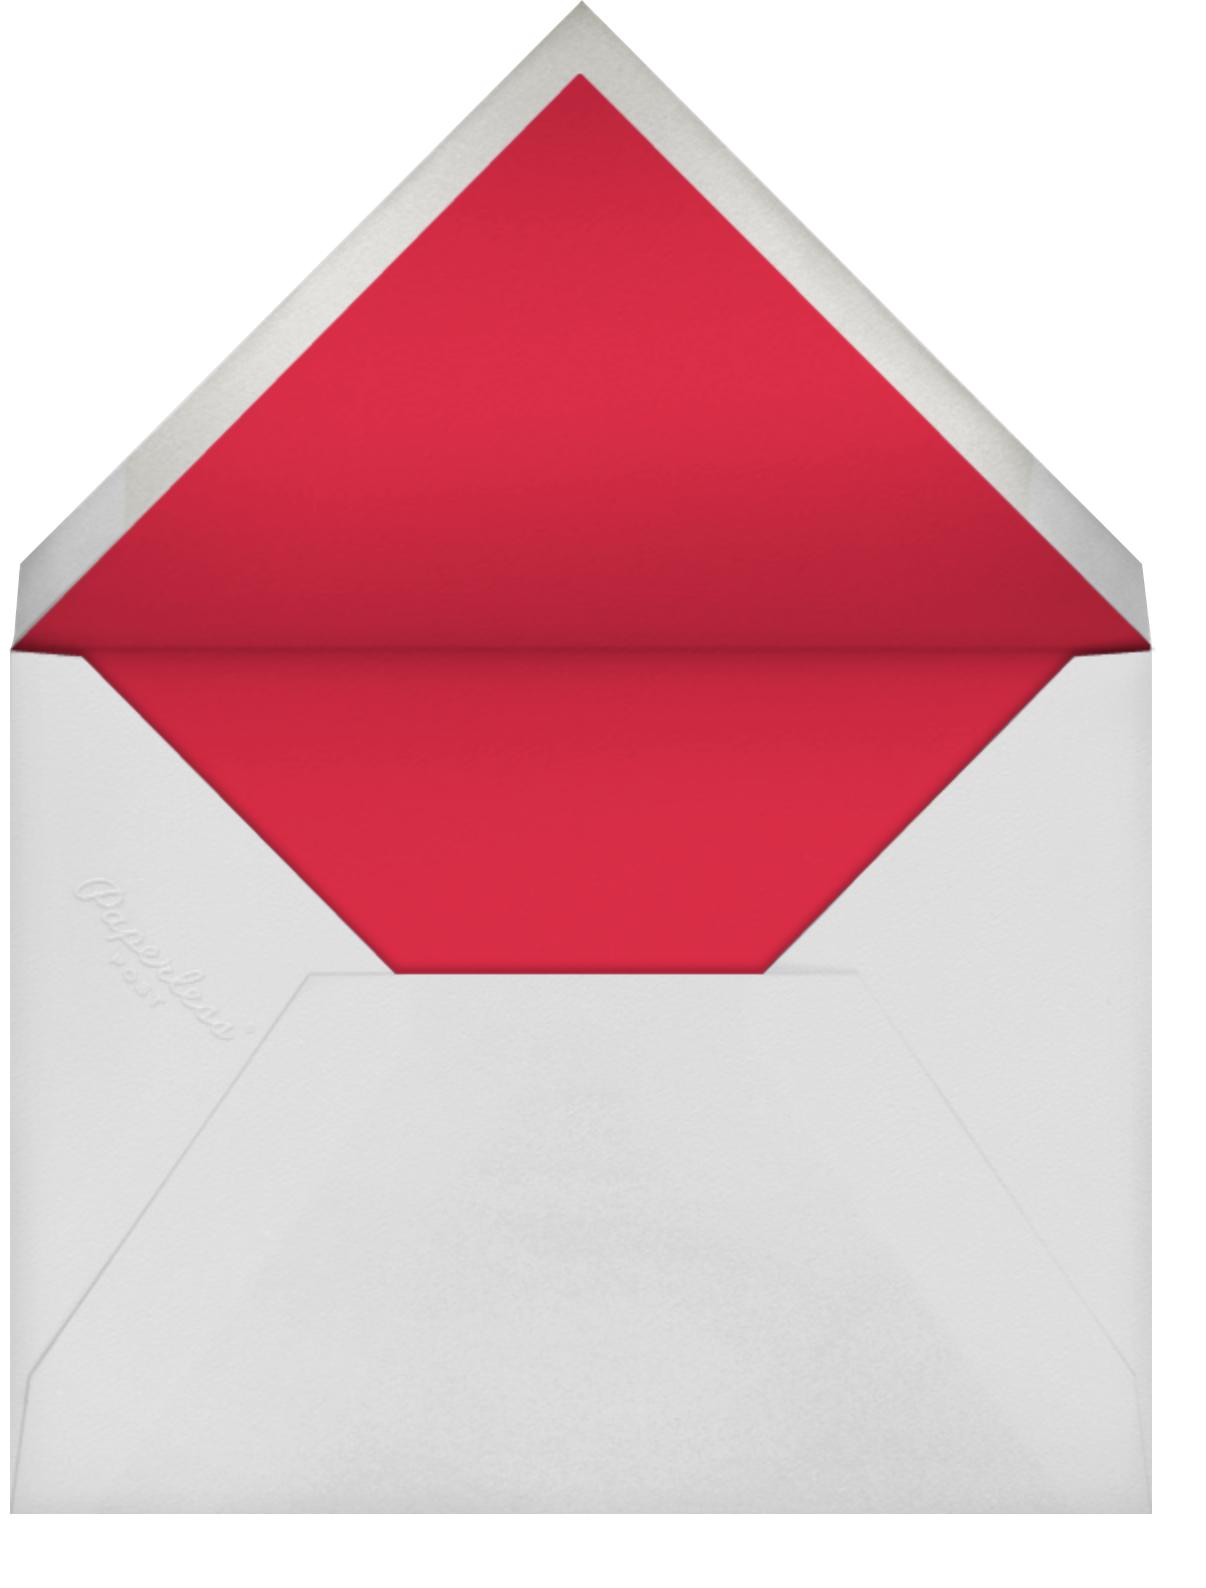 English Garden (Stationery) - Oscar de la Renta - Personalized stationery - envelope back